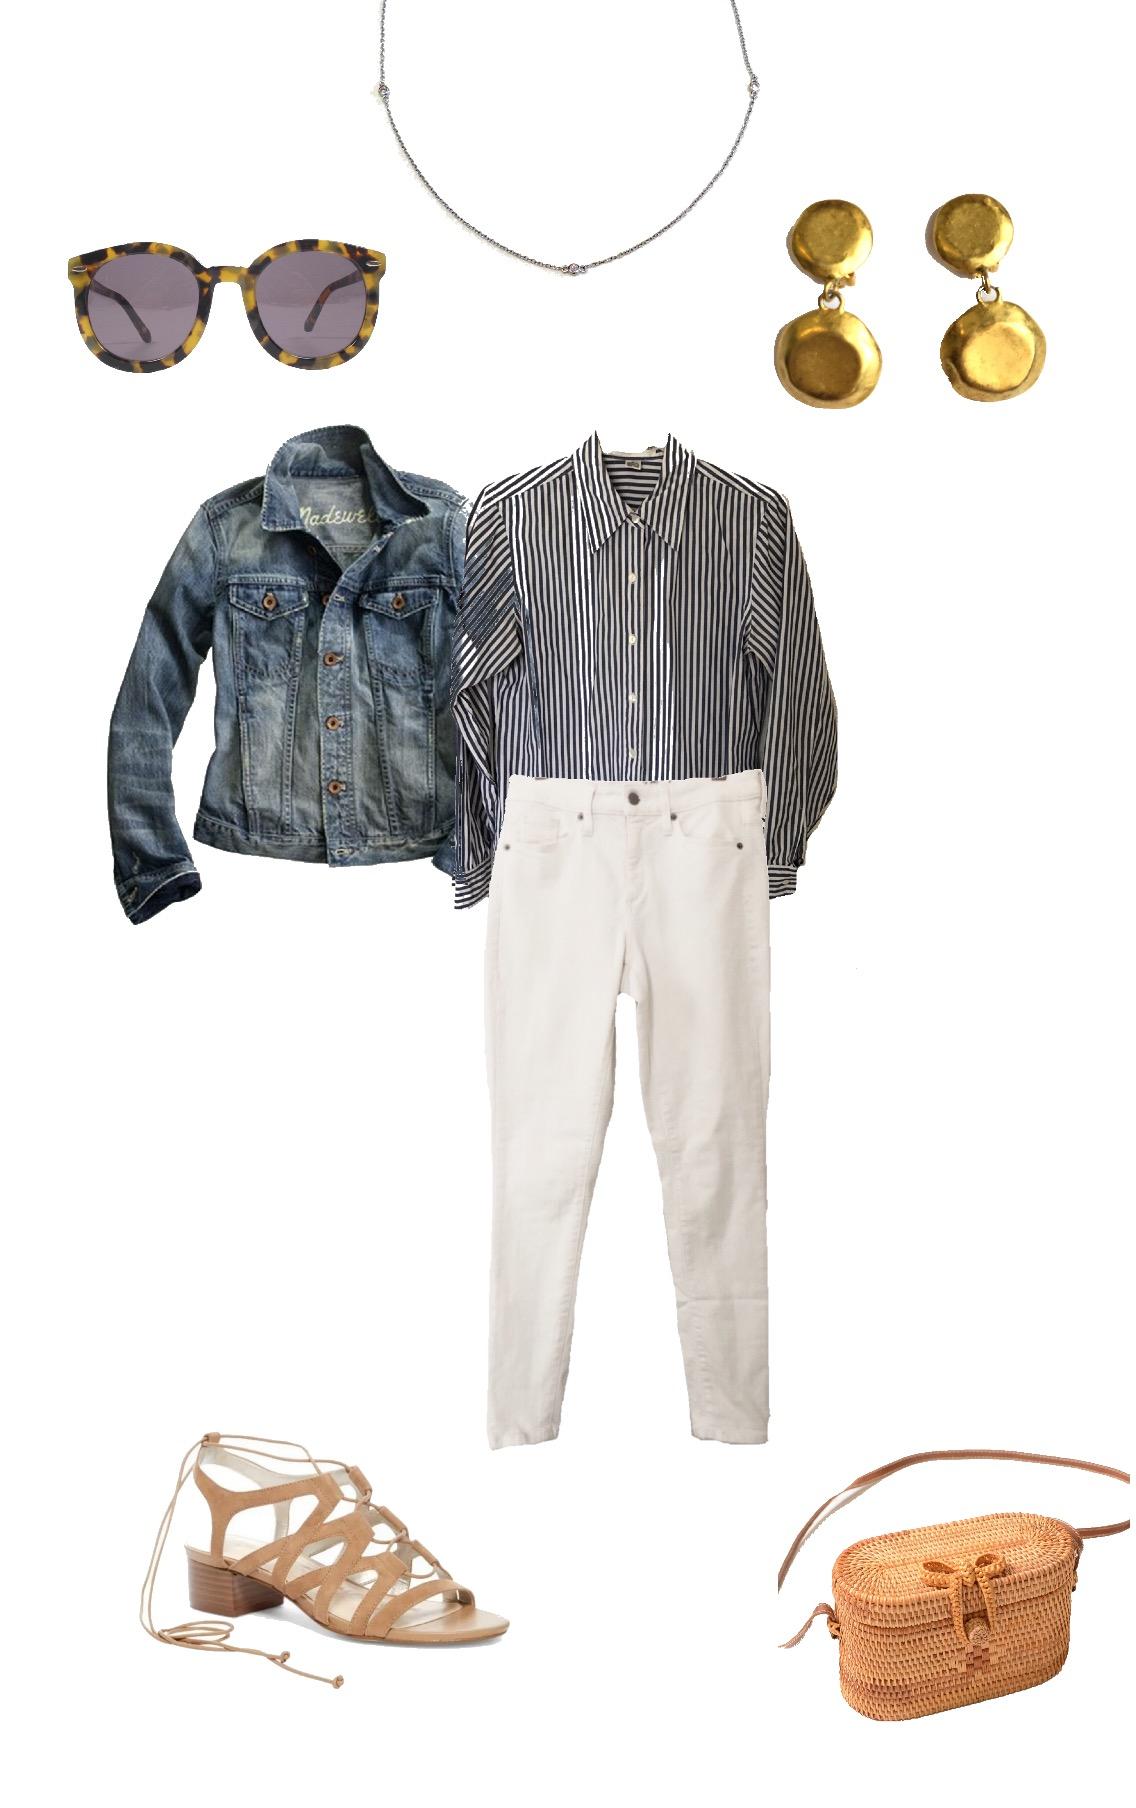 Karen Walker Sunglasses    , Diamond Necklace (similar     here    ), Gold Earrings (similar     here    ), Madewell Jean Jacket (similar     here    ), Blue Striped Shirt (similar     here    ), White Jeans (similar     here    ), Sam Edelman Sandals (similar     here    ),     Woven Purse